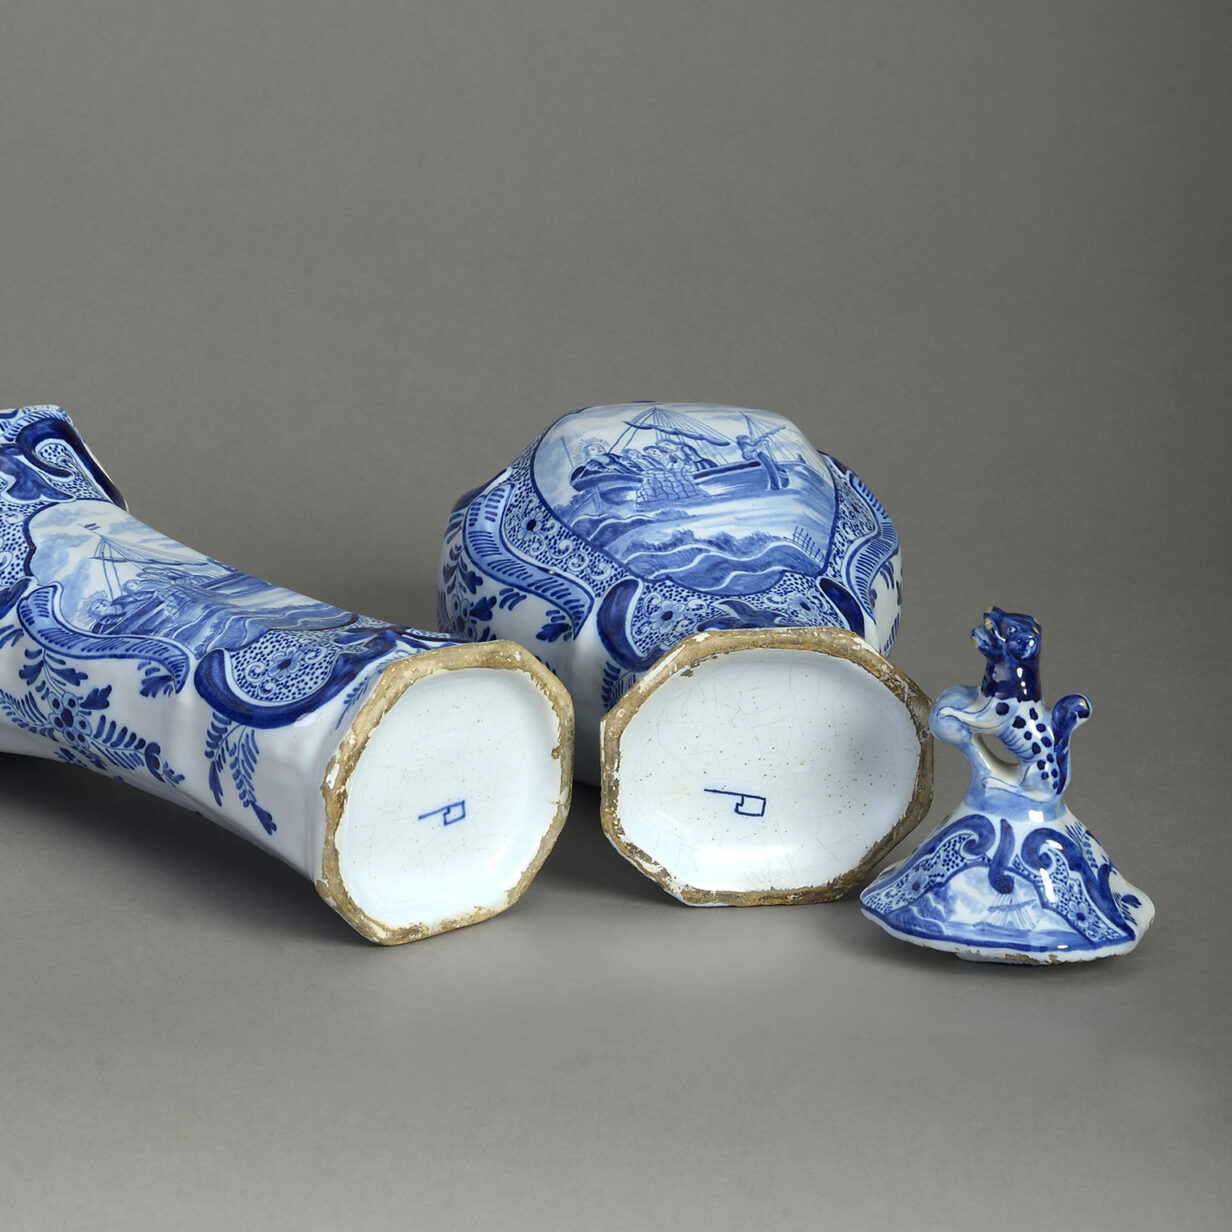 Garniture of Five Delft Blue and White Vases